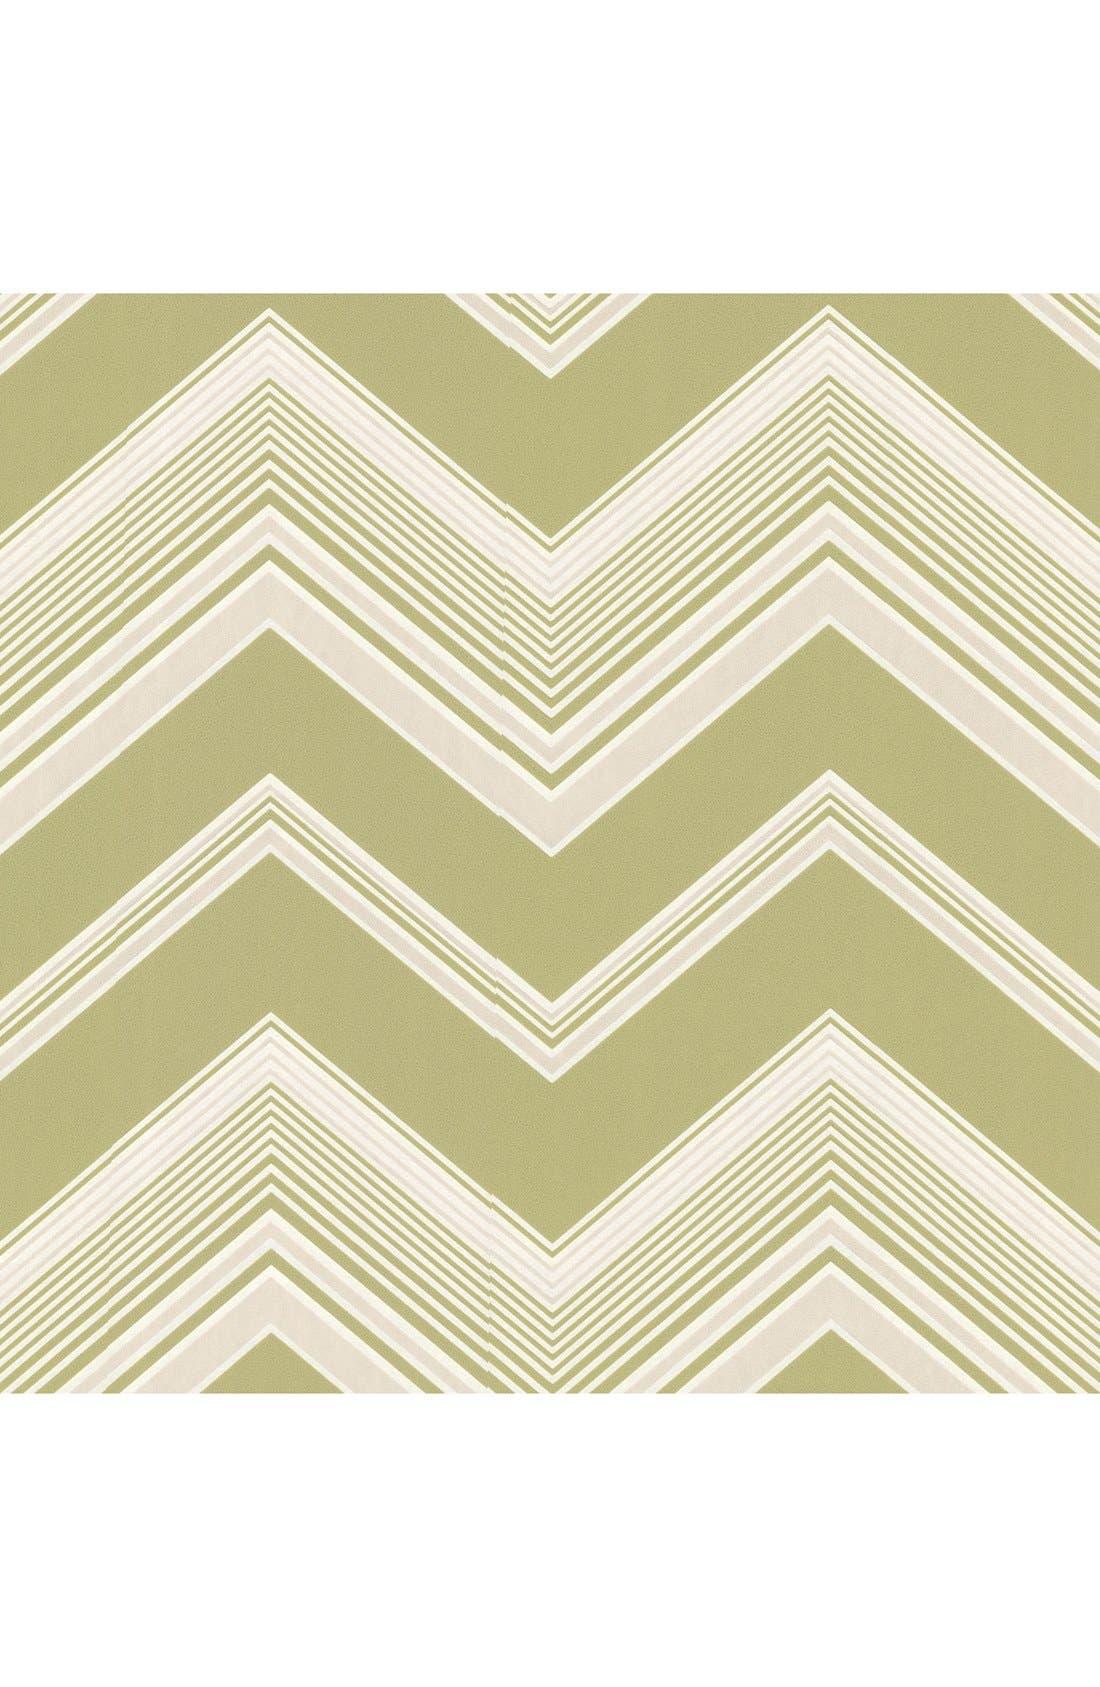 Alternate Image 1 Selected - Wallpops 'Bearden Light - Zigzag' Unpasted Wallpaper